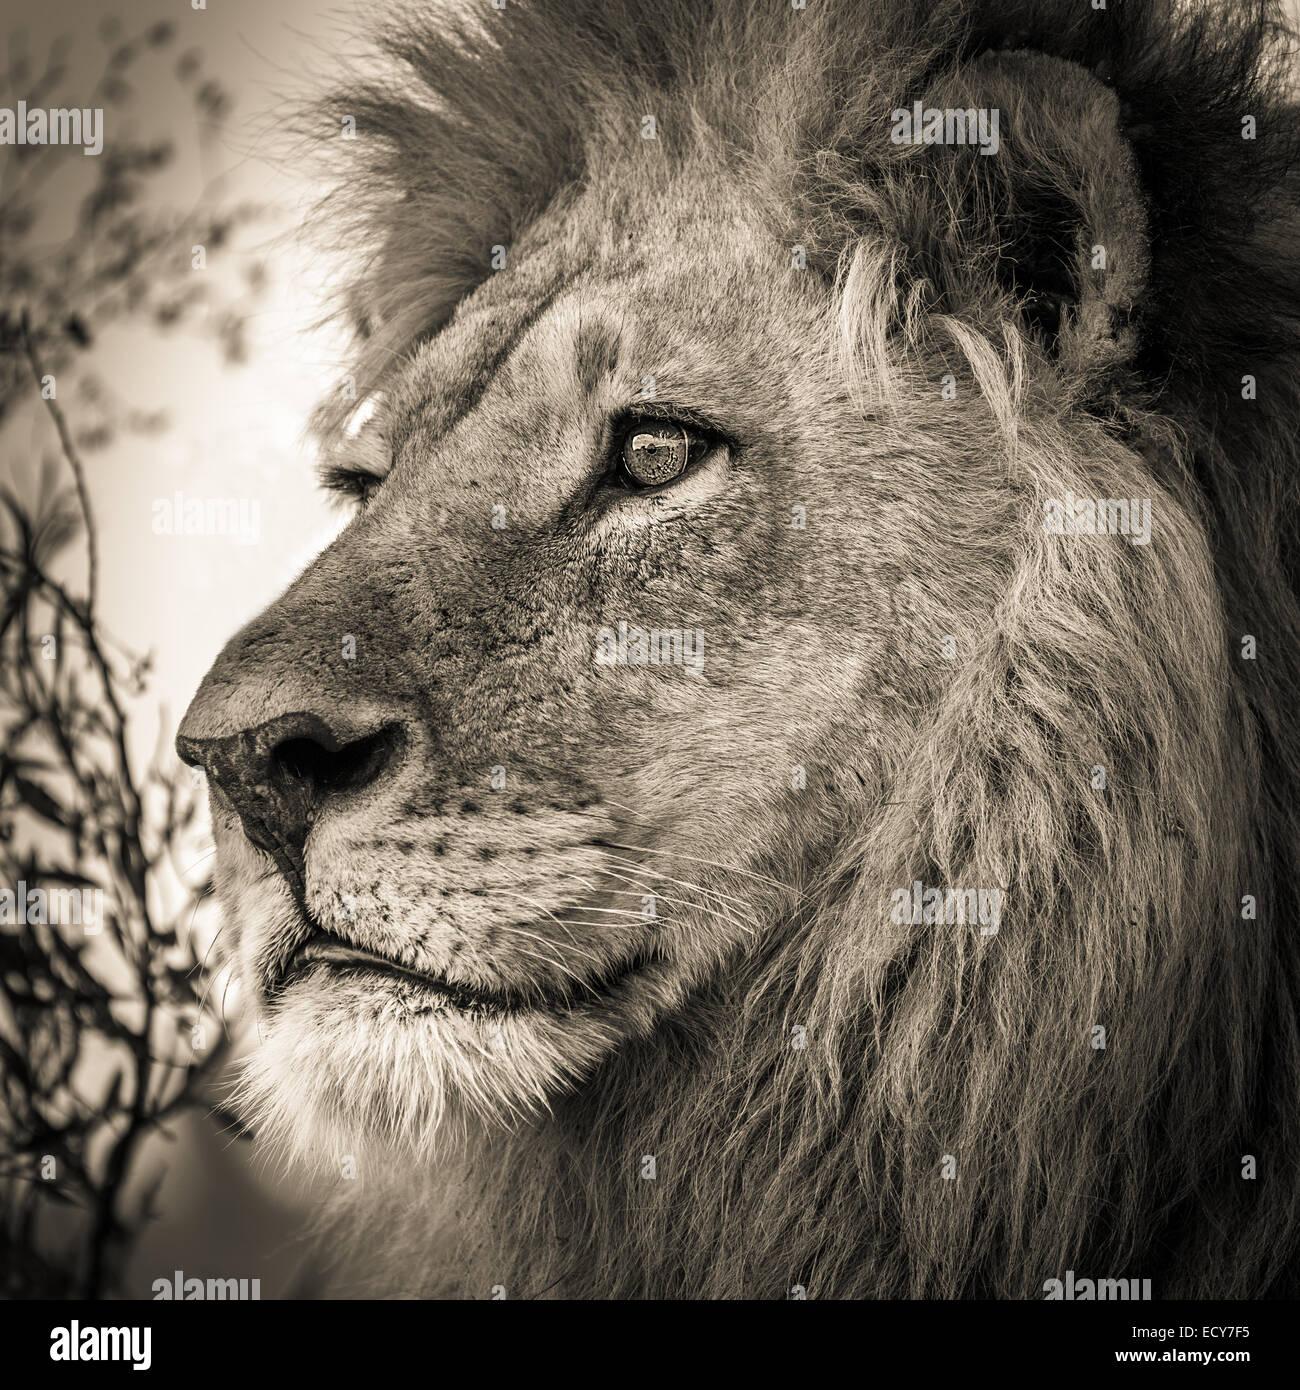 Male lion (Panthera leo), Okavango Delta, Botswana - Stock Image